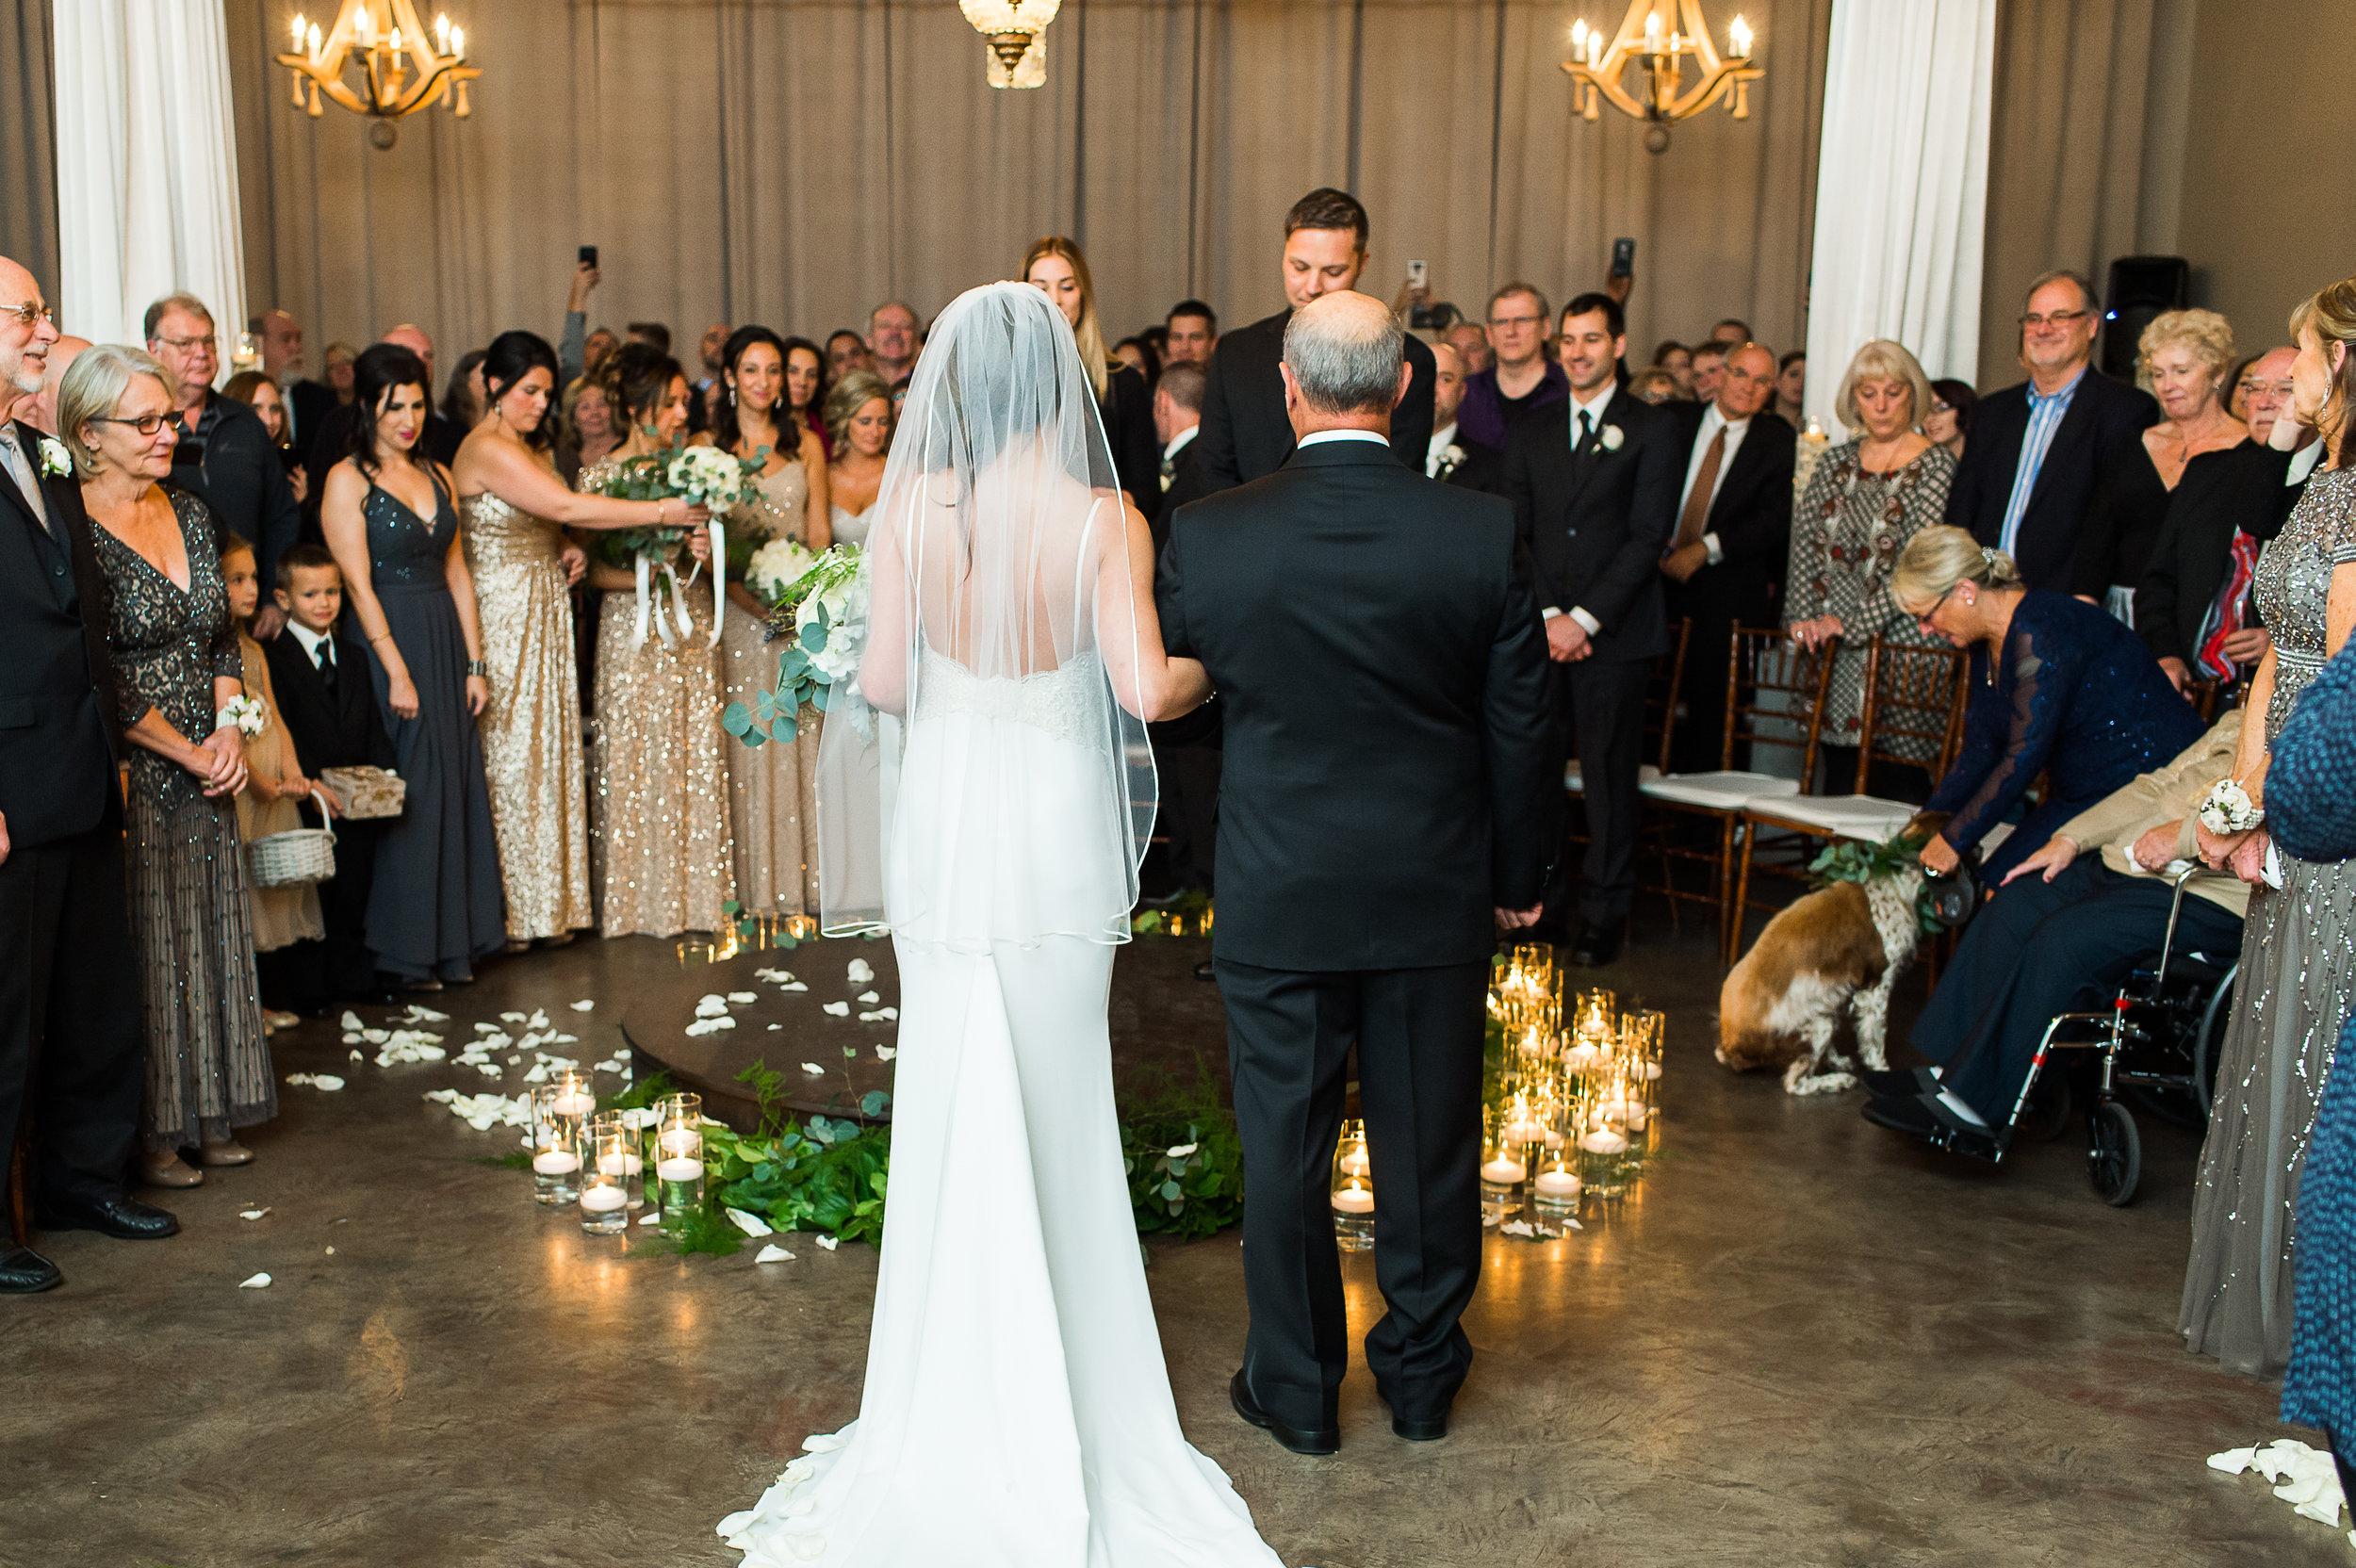 JJ-wedding-Van-Wyhe-Photography-357.jpg